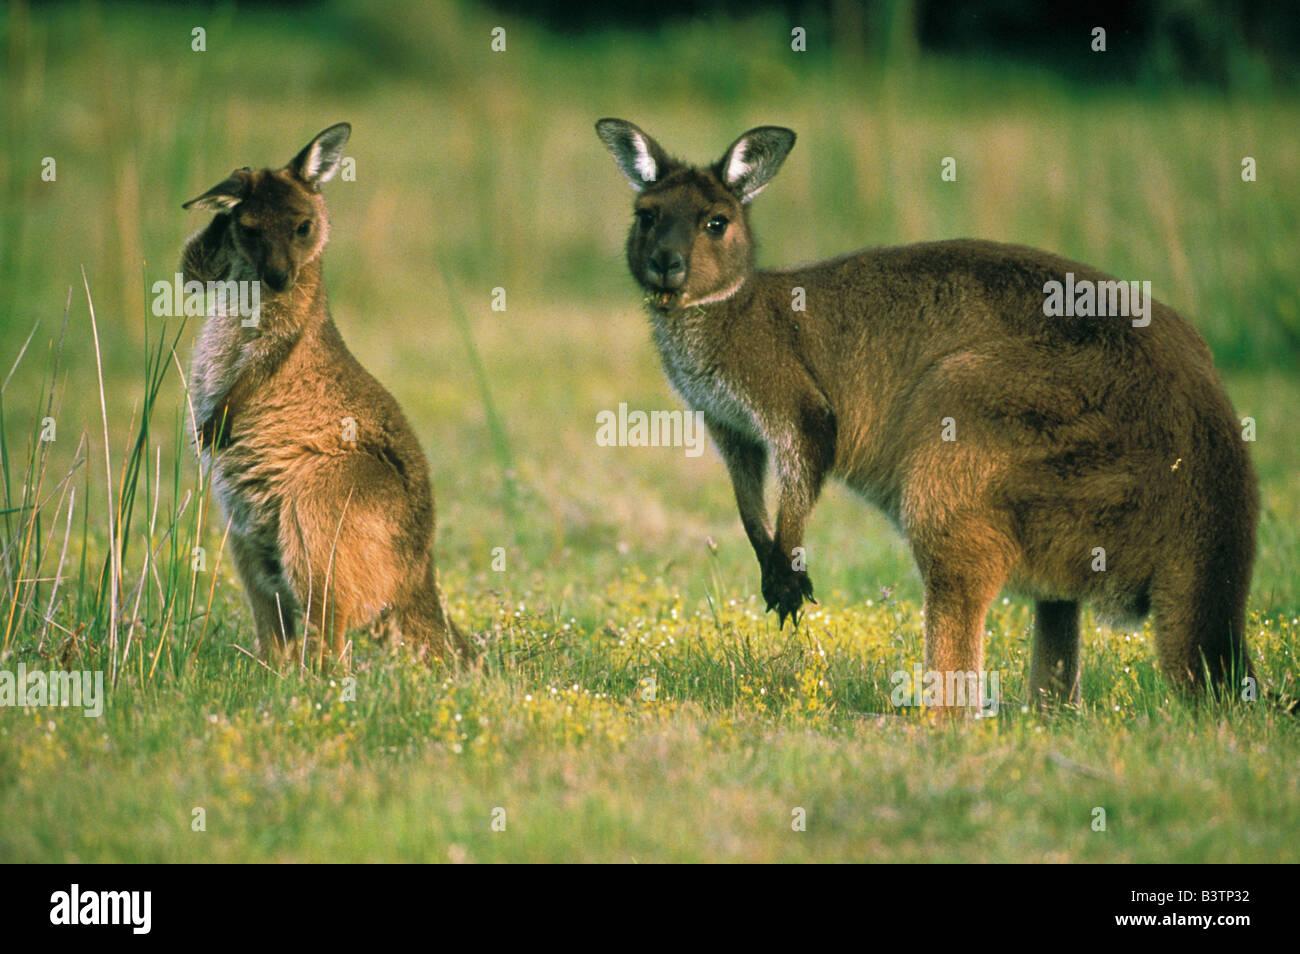 Australia, Kangaroo Island. Mother and Joey, subspecies of Western Grey Kangaroo. Stock Photo